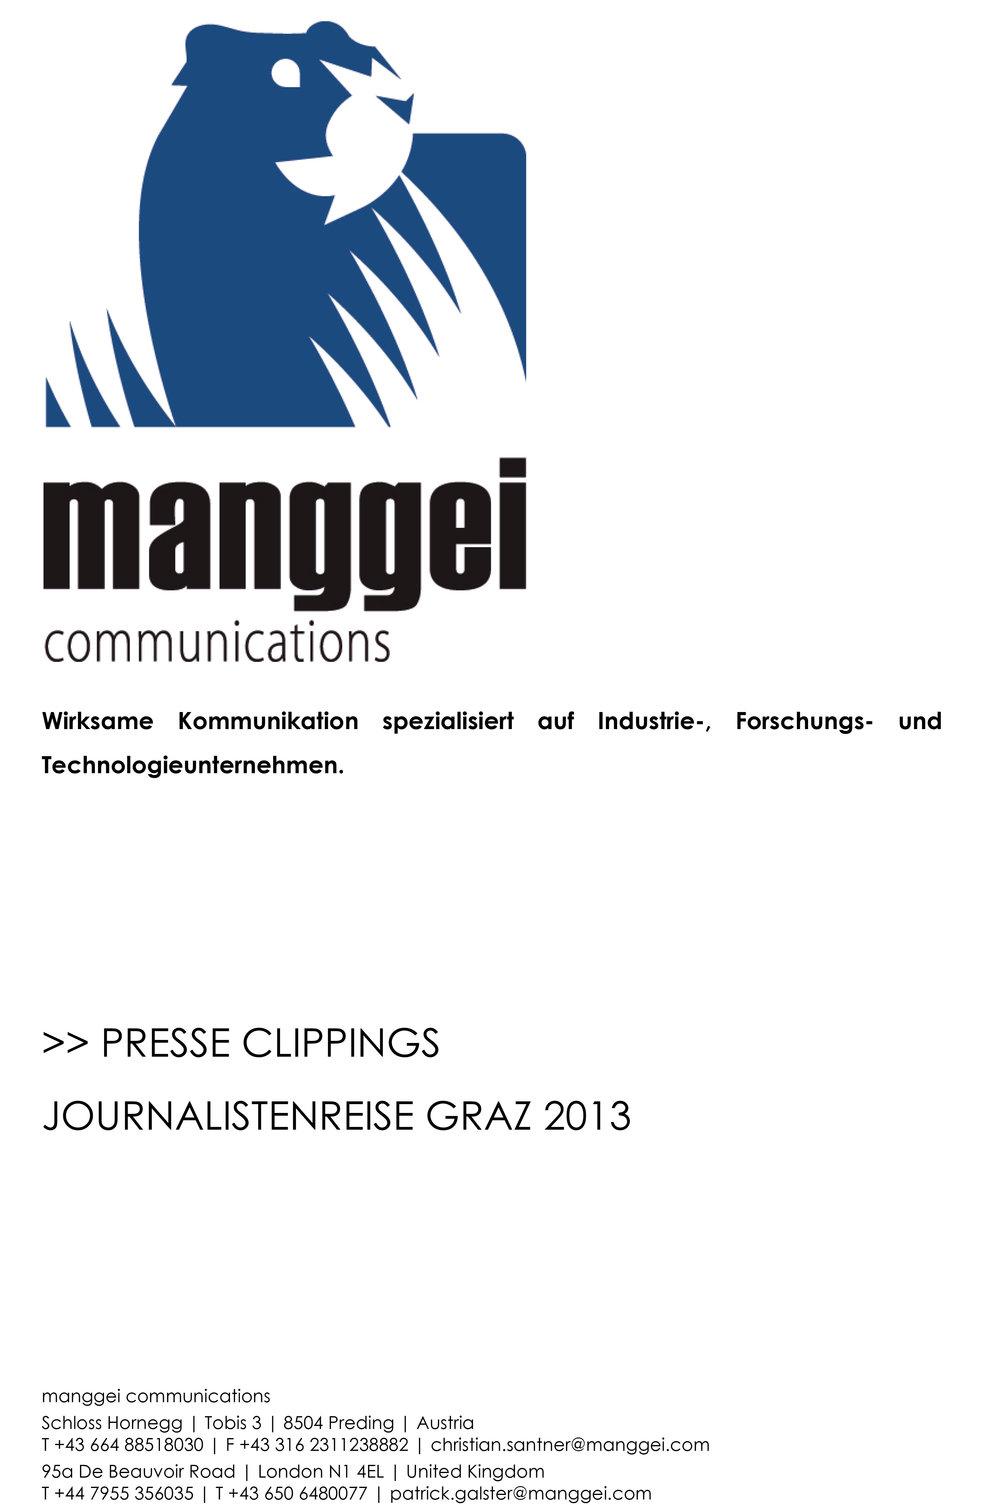 manggei-communications---presse-clippings-komplett---journalistenreise-2013_-1.jpg